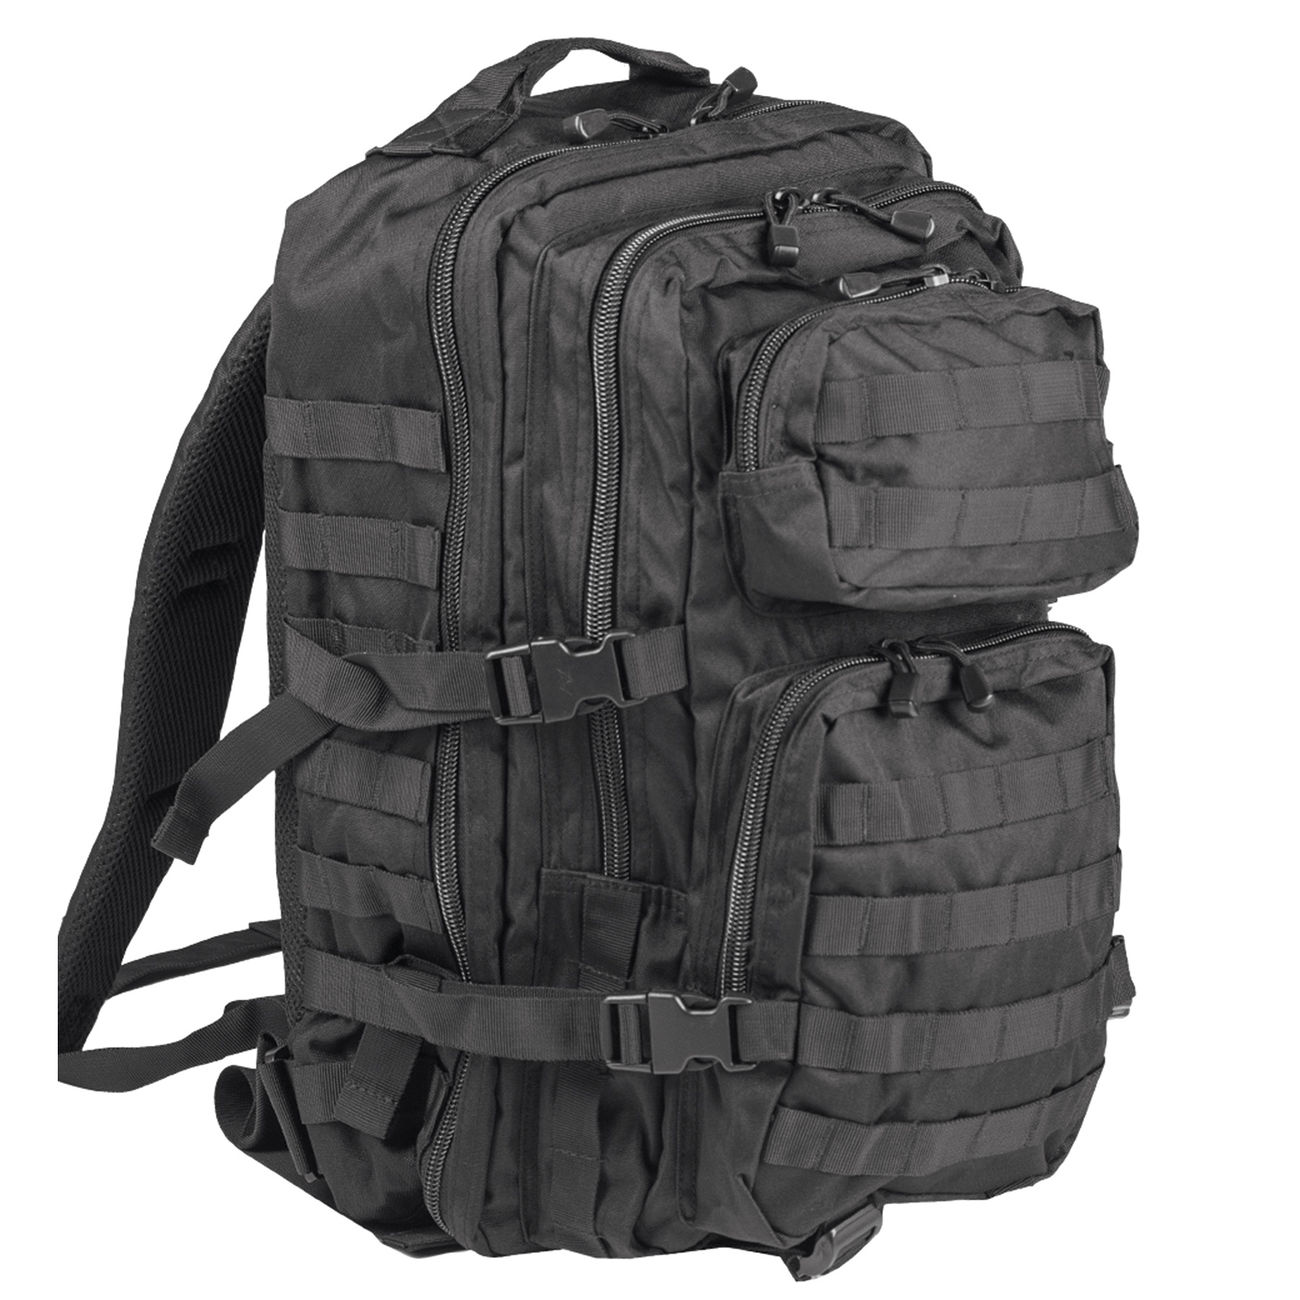 Mil Tec US Assault Pack online günstig kaufen